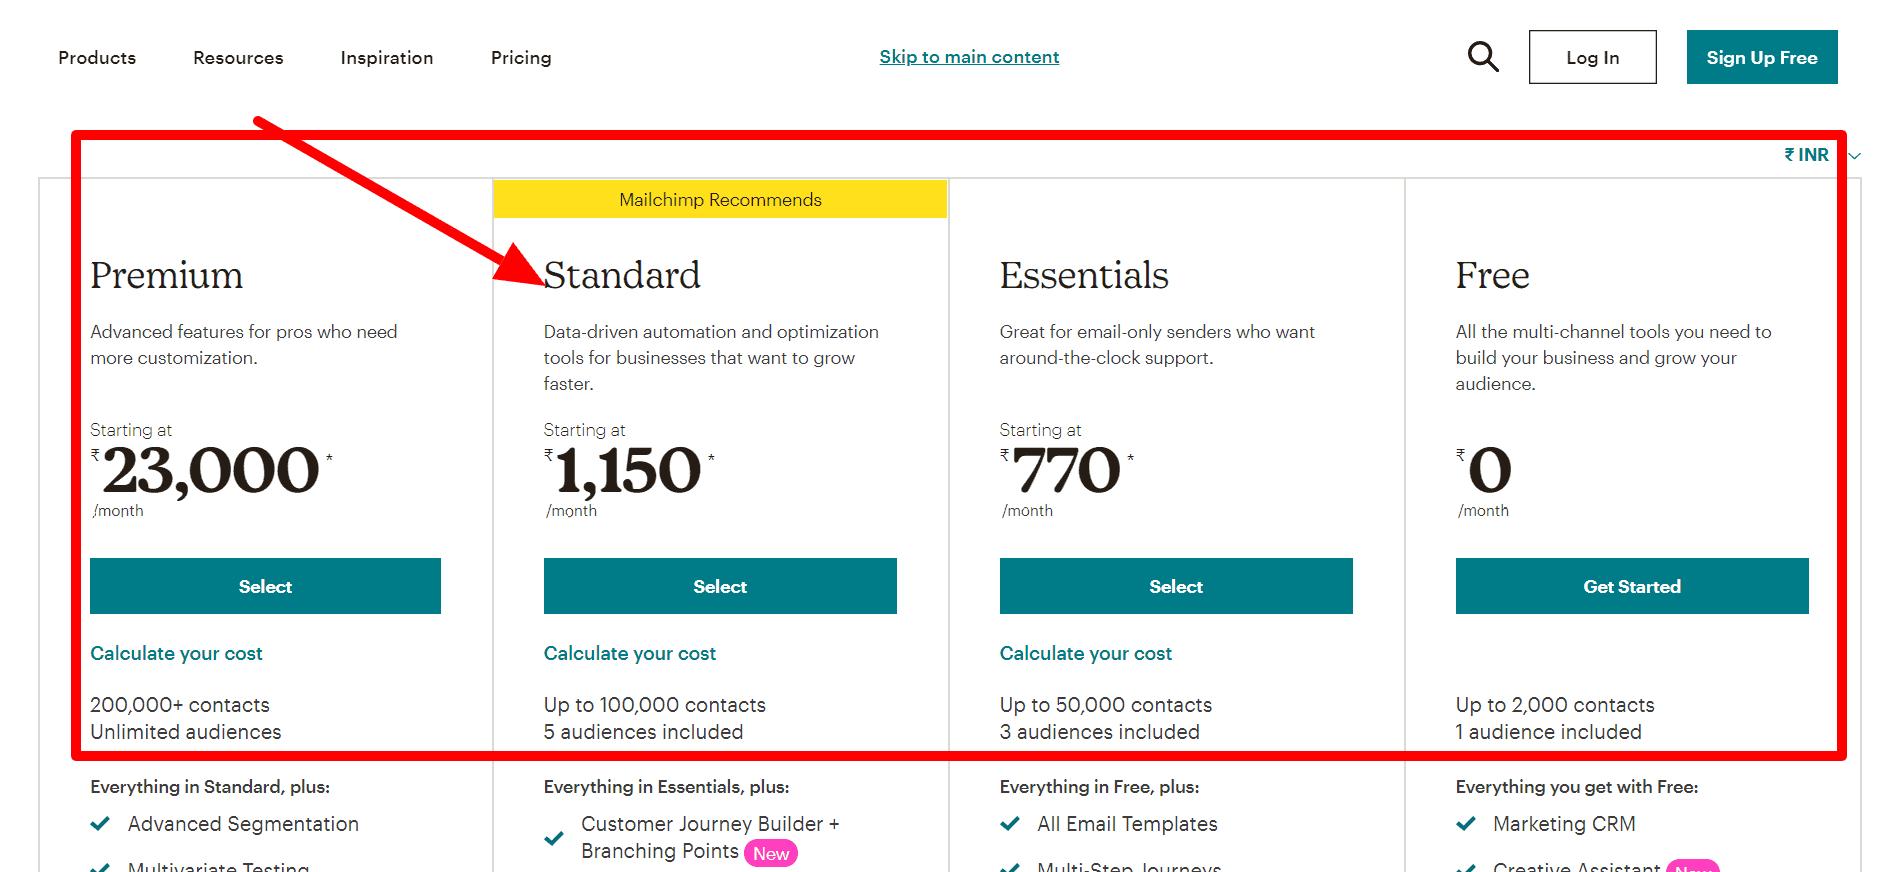 Mailchimp Pricing- Engagebay vs Mailchimp